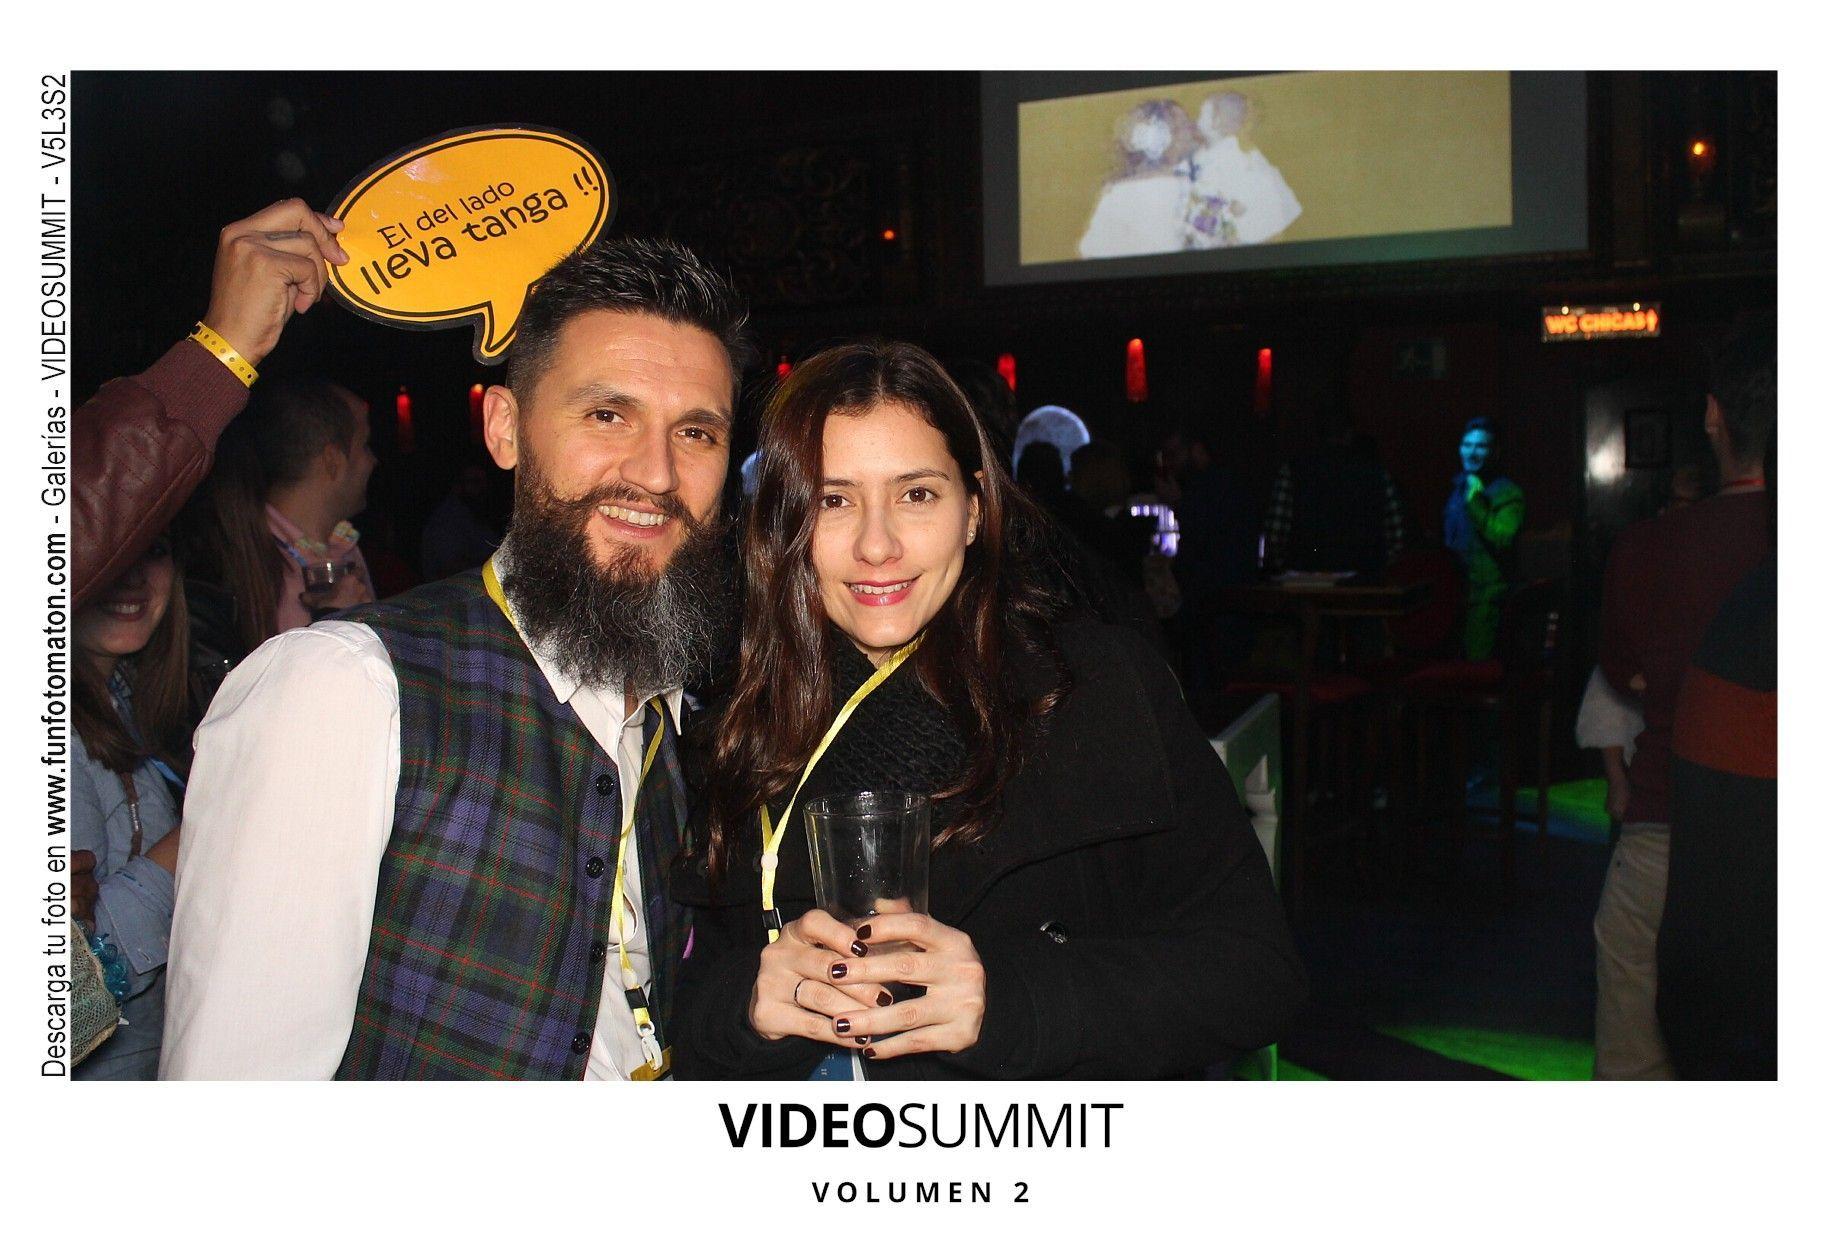 videosummit-vol2-club-party-026